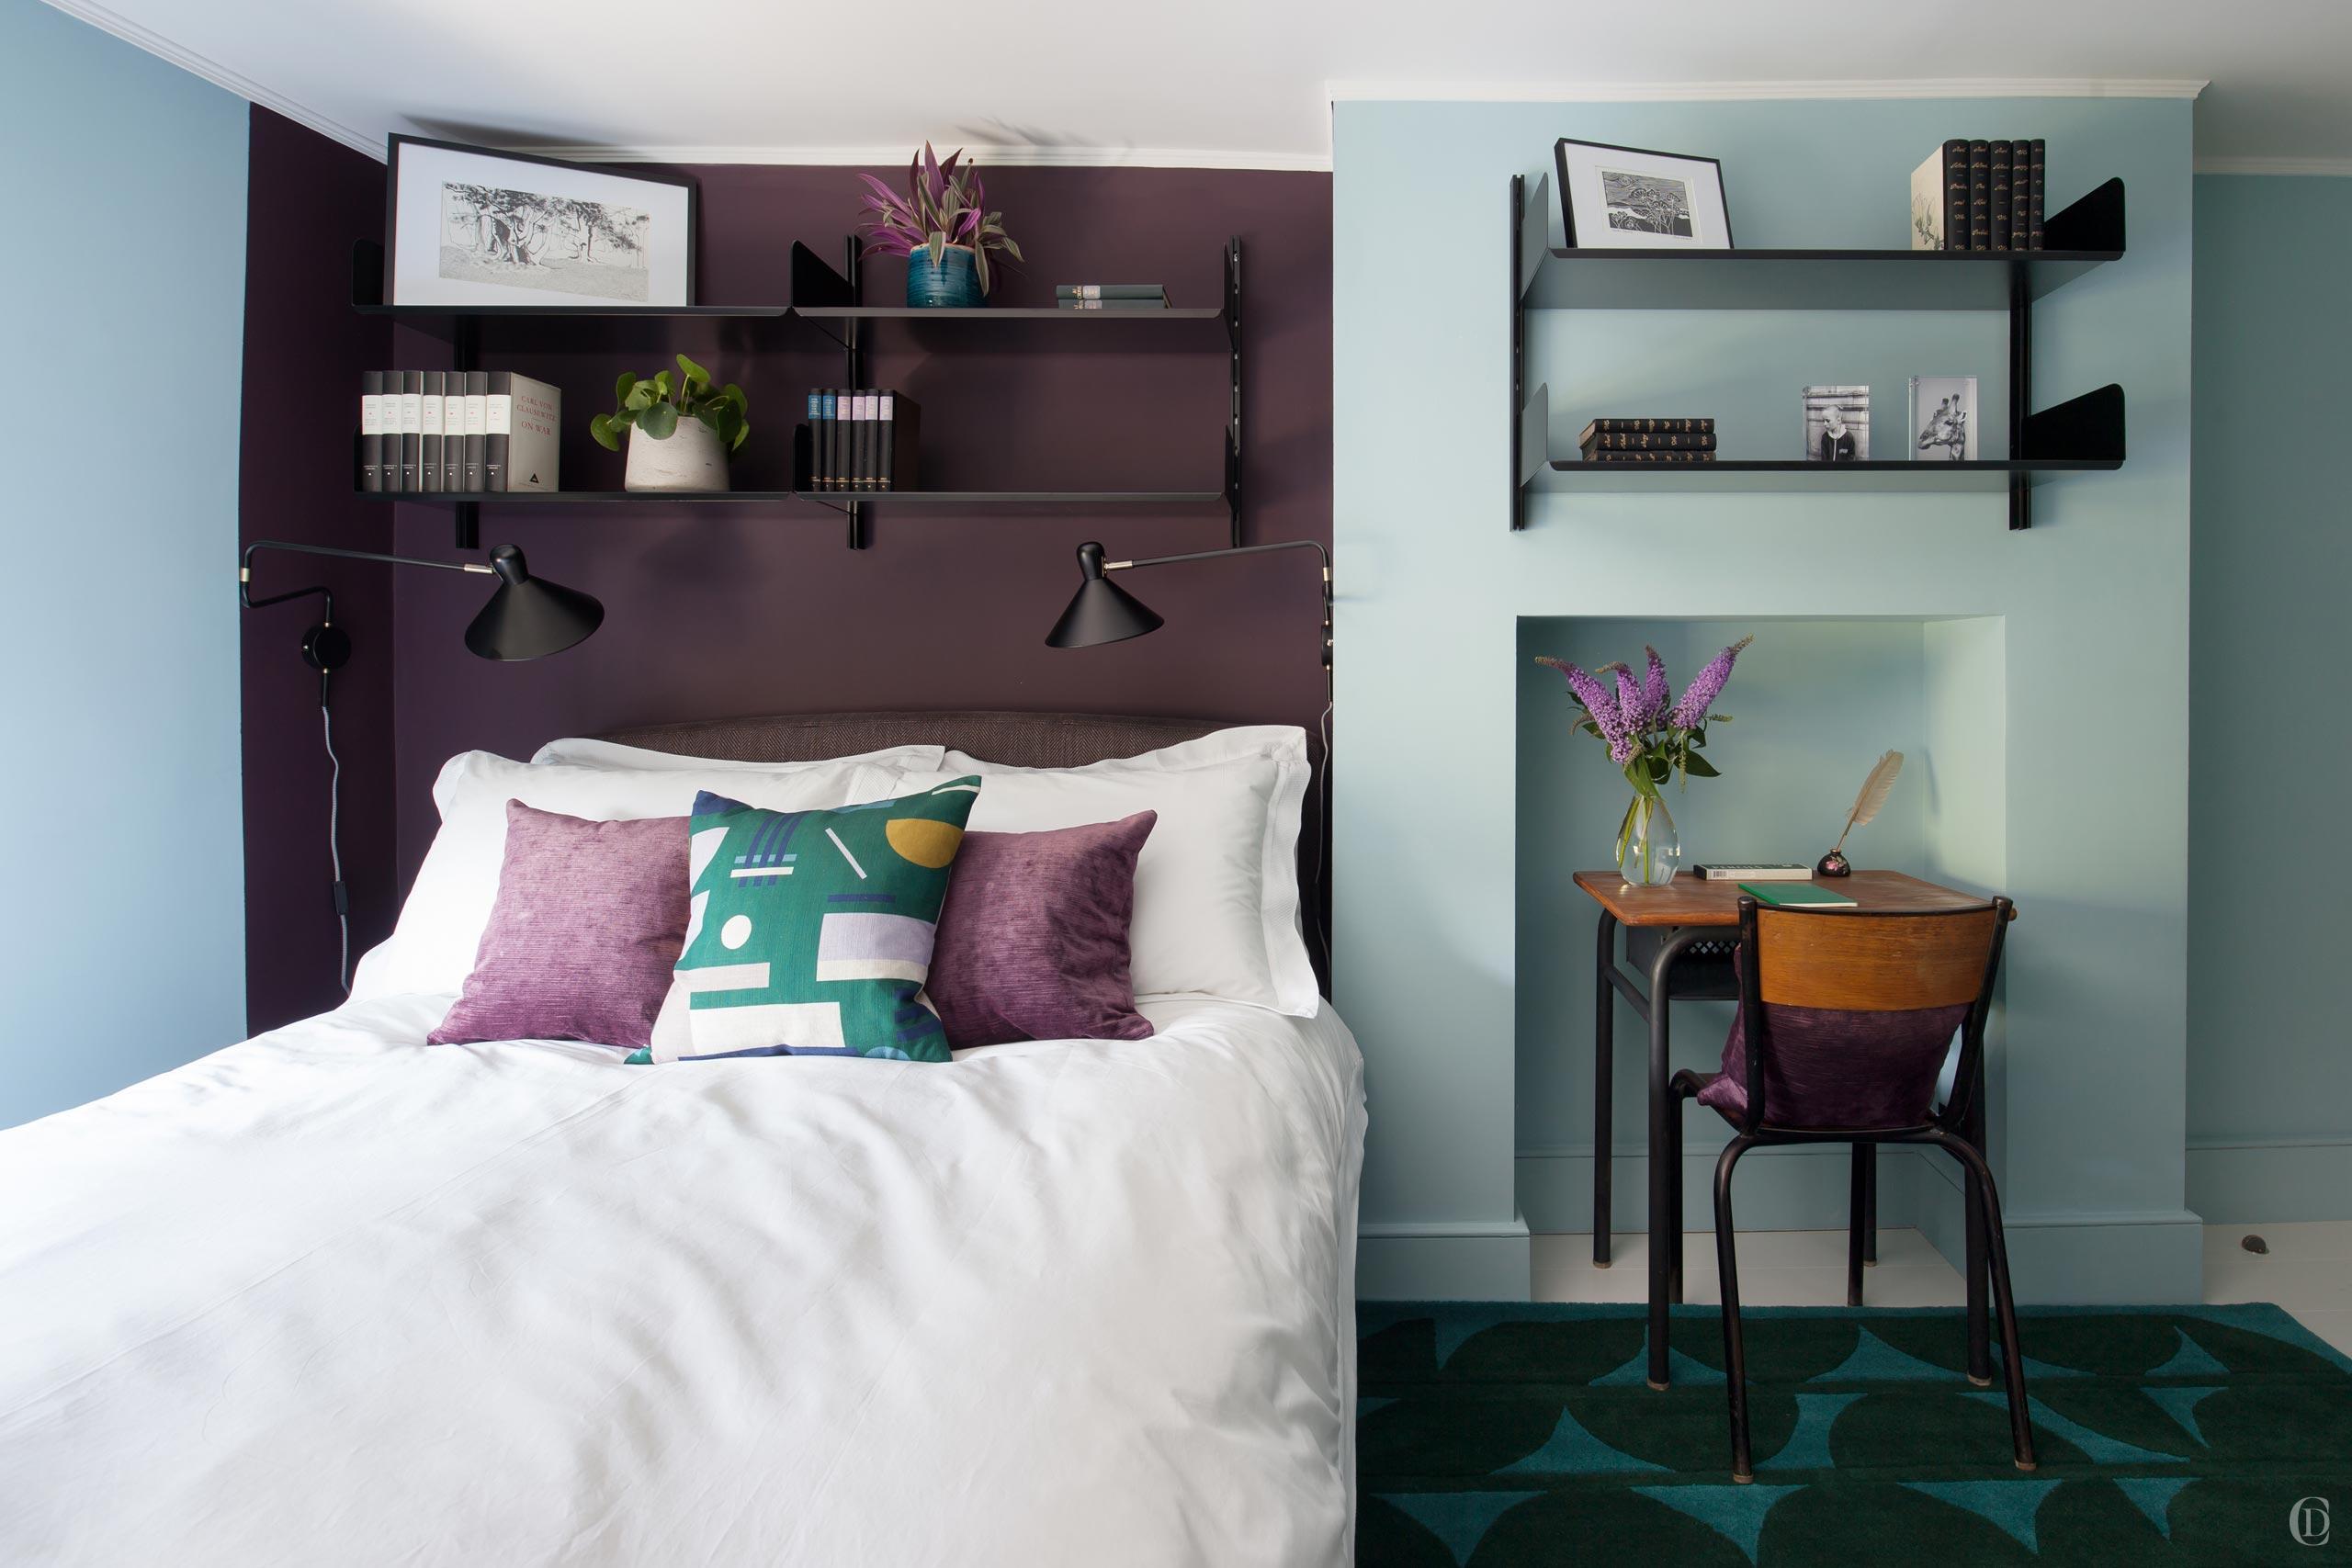 Interior Designer Claudia Dorsch Shares Ideas For Small Bedrooms